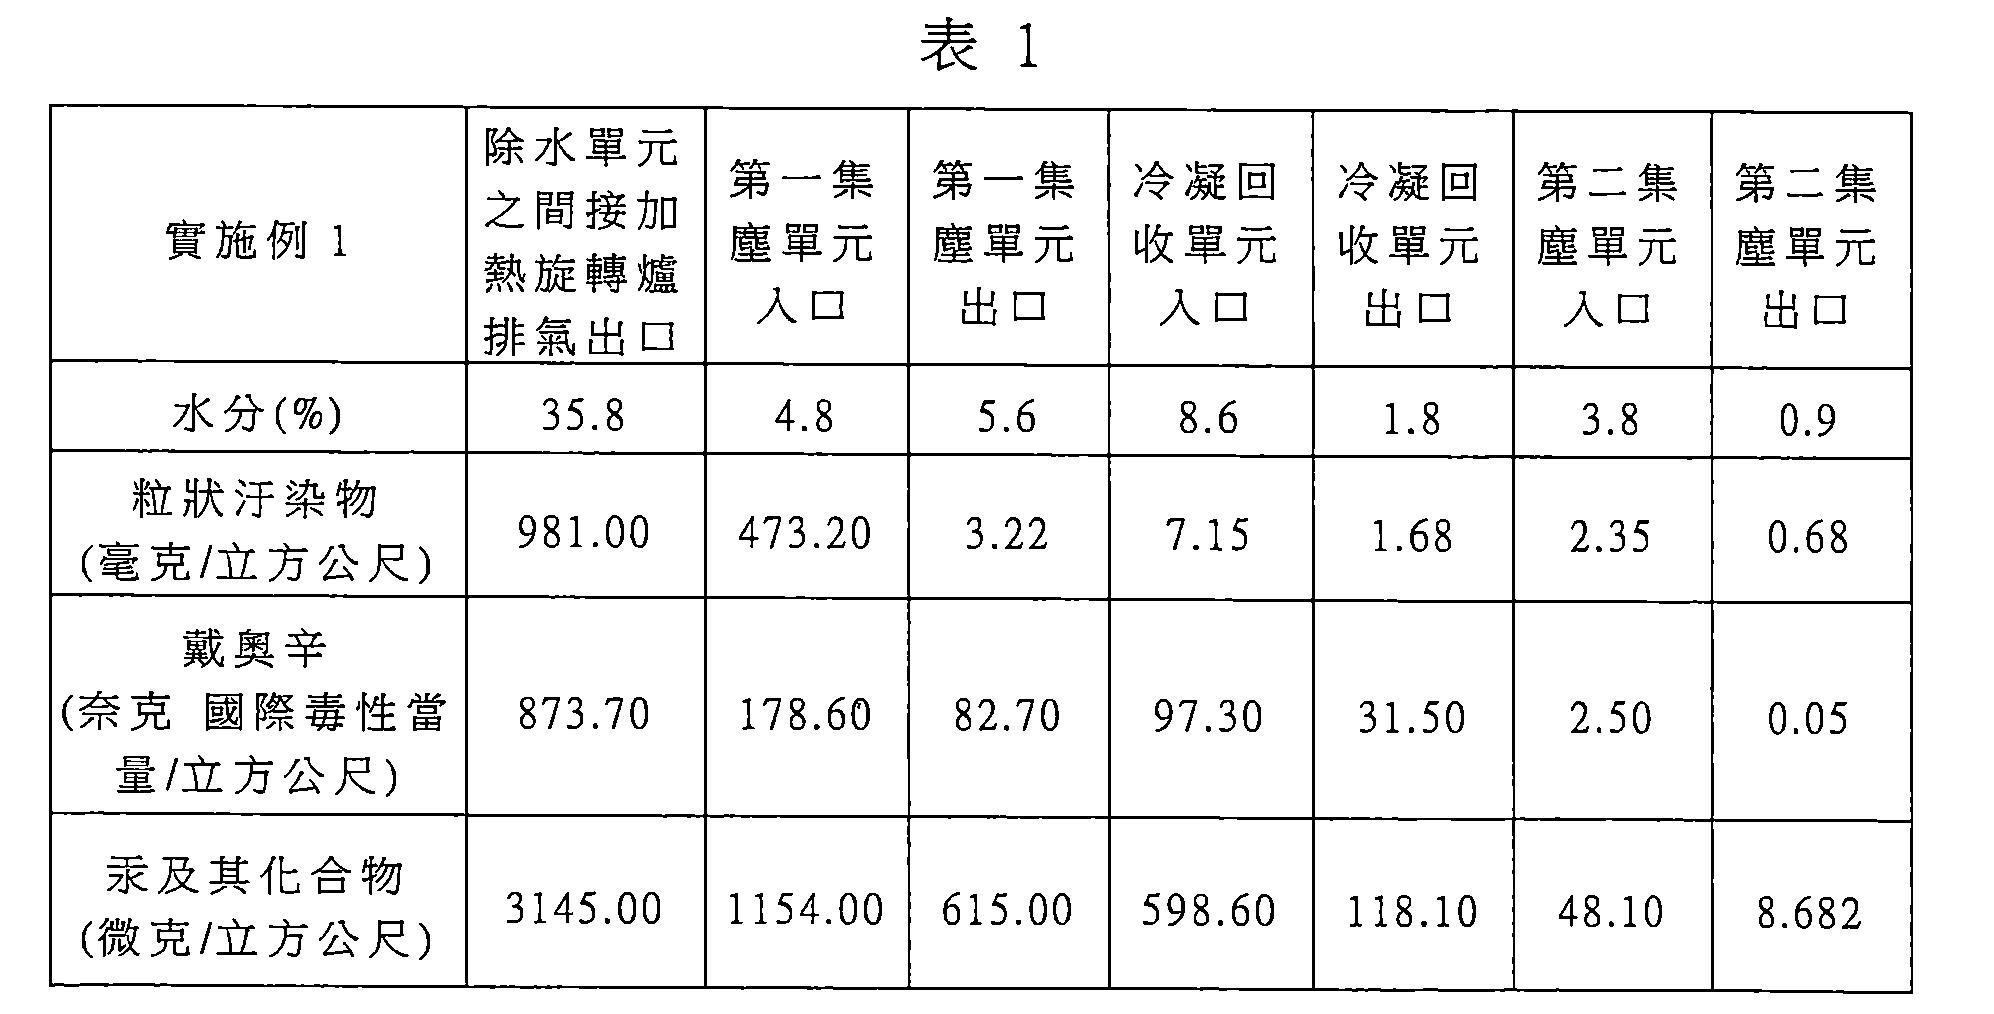 Figure 106130287-A0101-12-0012-2